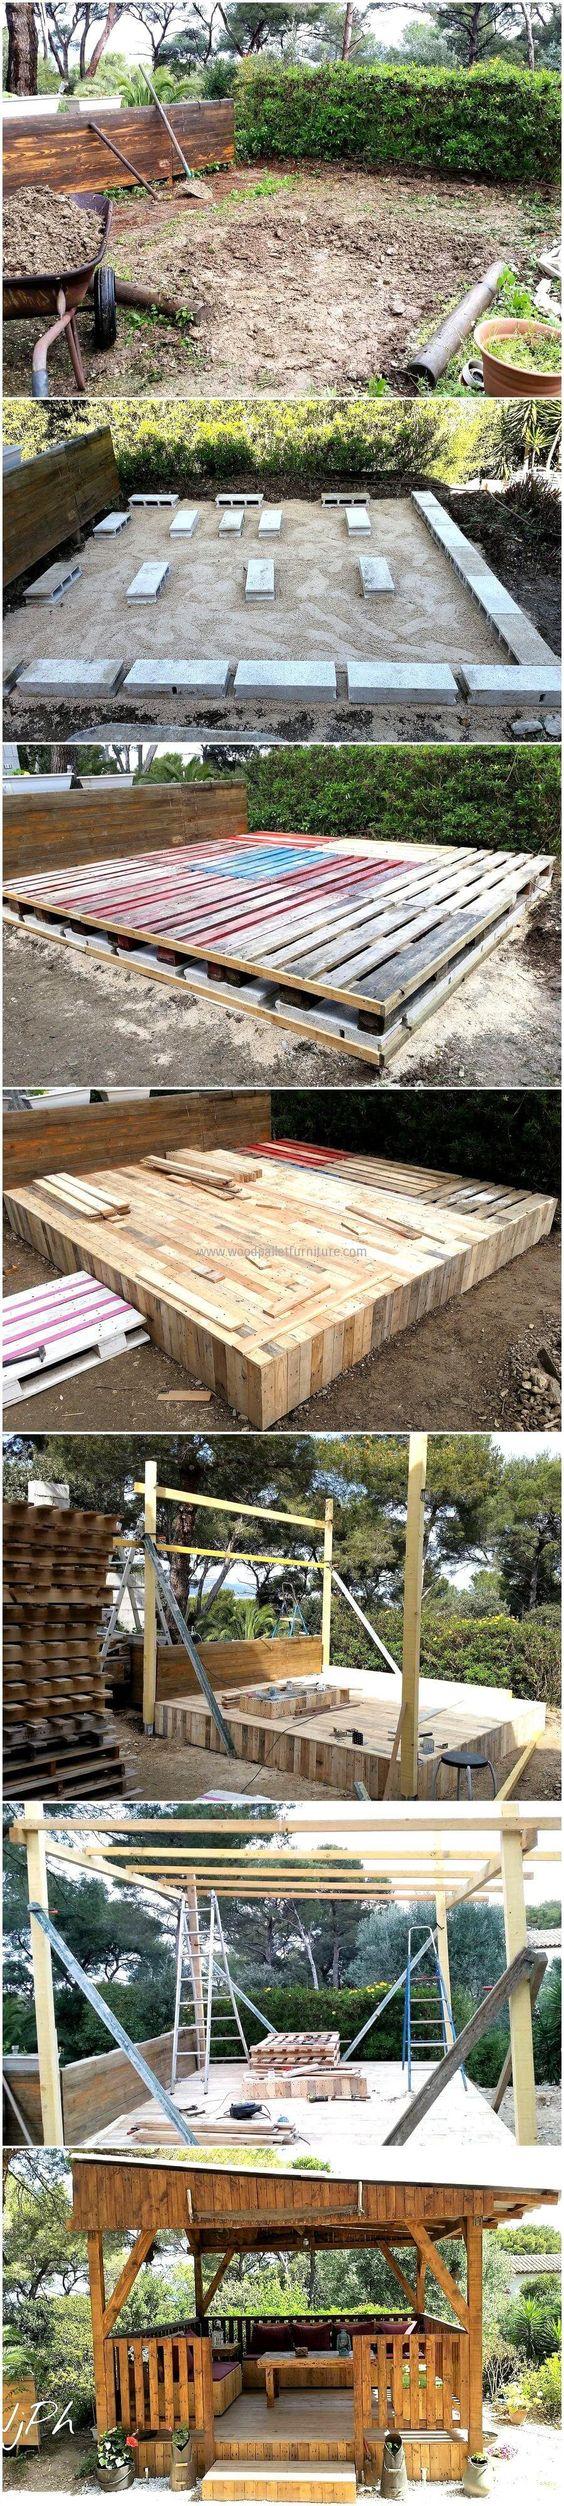 Diy wood pallet garden gazebo deck with furniture recup for Amenagement jardin recup